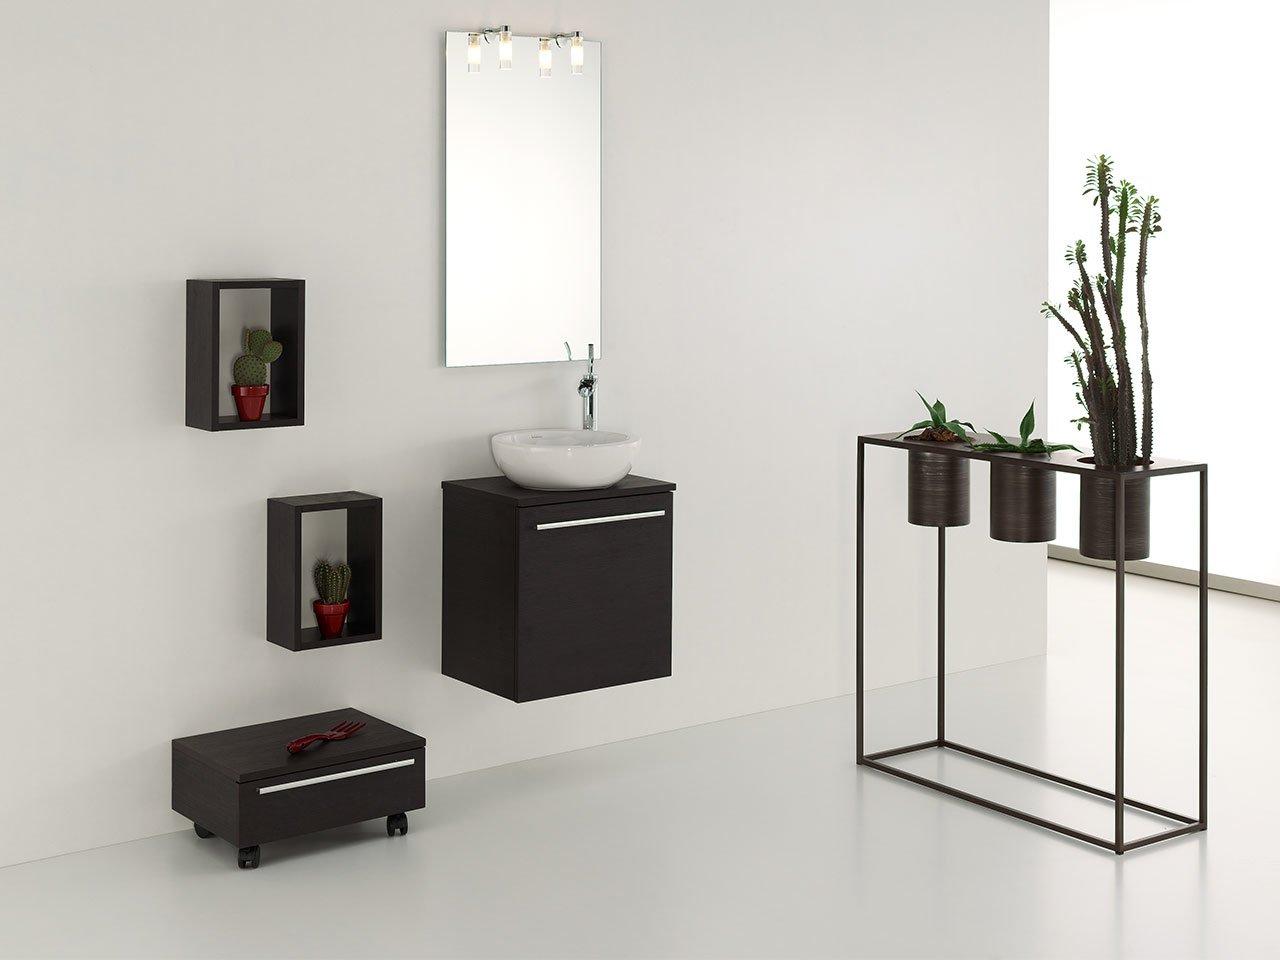 mobili wenge per bagno elegante : Mobili Bagno Moderni Wenge : Home page Mobili bagno Mobili moderni ...